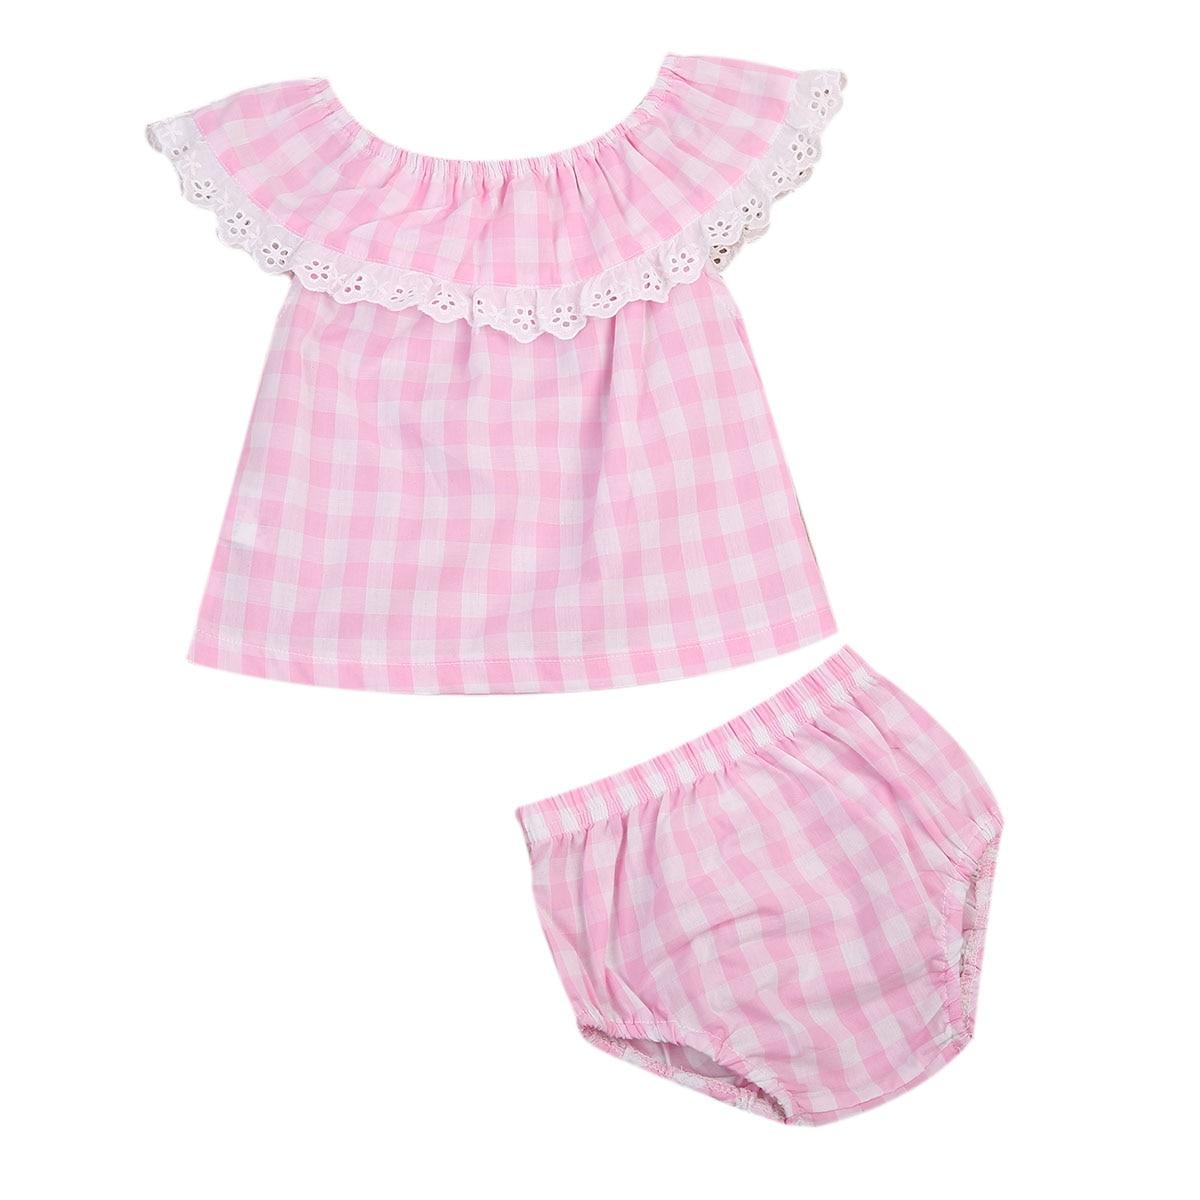 2Pcs Toddler Baby Girls Pink Plaid Lace Tops Shirt Shorts Outfits O-Neck Clothes Summer Cute Princess Girl Clothes set